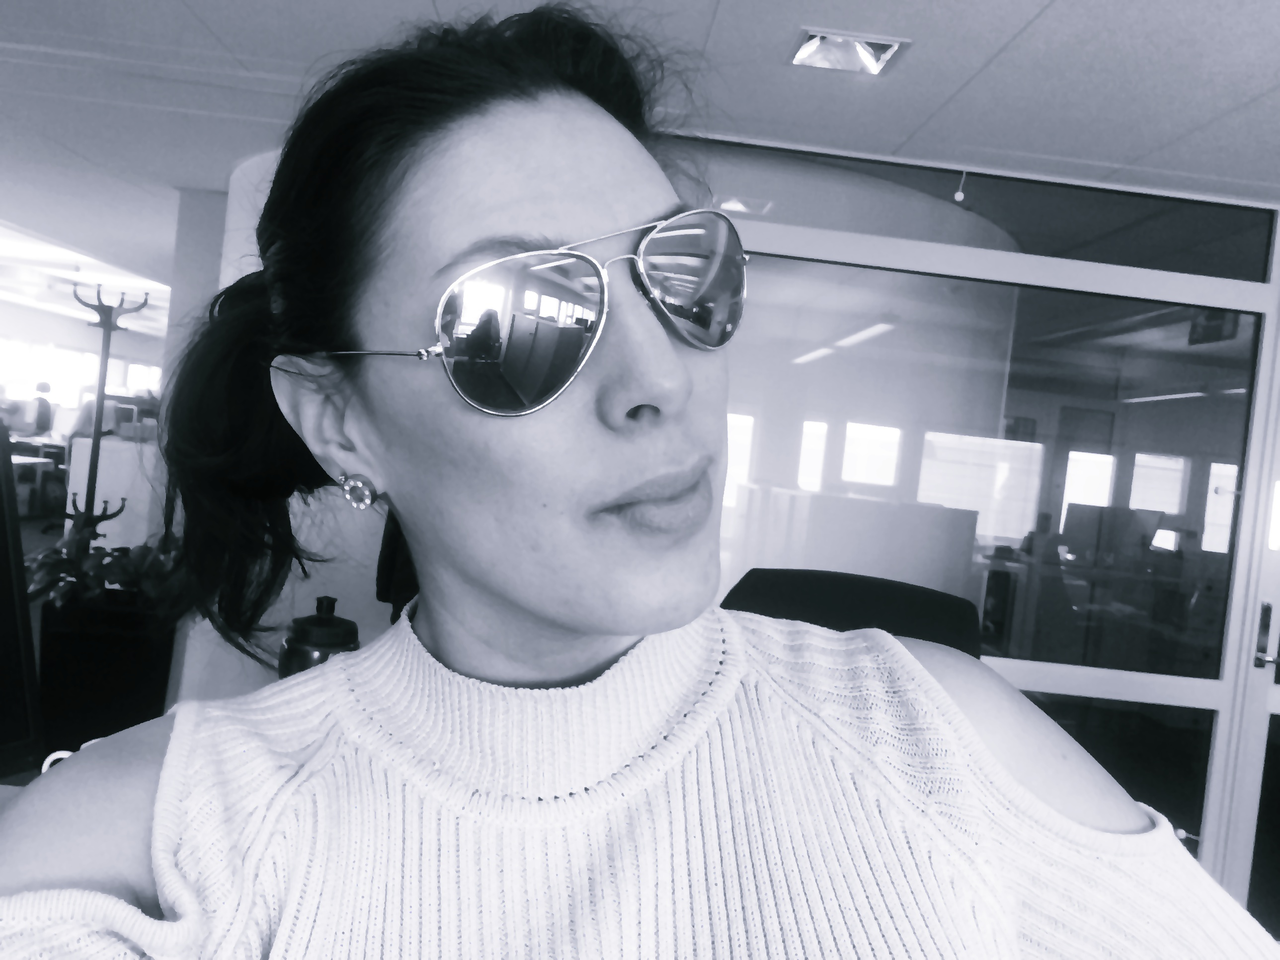 at_work_selfie_blackandwhite